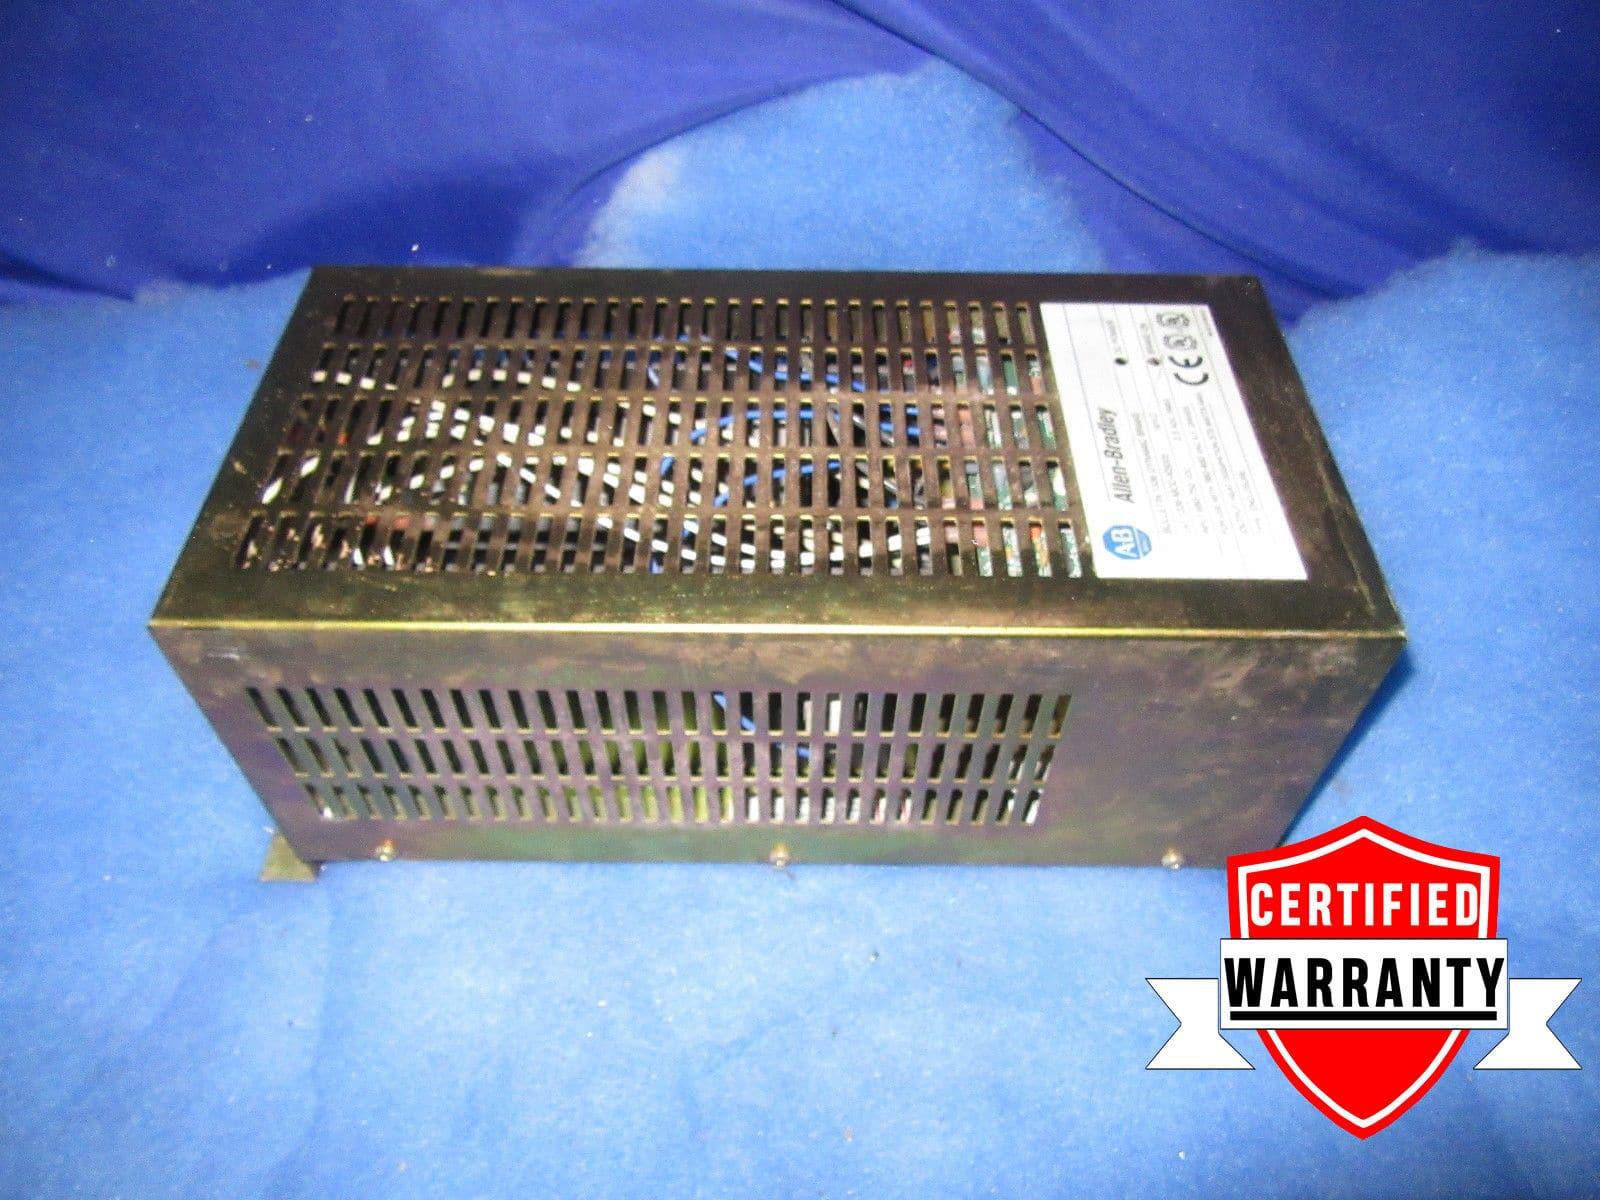 ALLEN-BRADLEY 1336-MOD-KB005 BULLETIN 1336 DYNAMIC BRAKE SERIES D 1yr  warranty